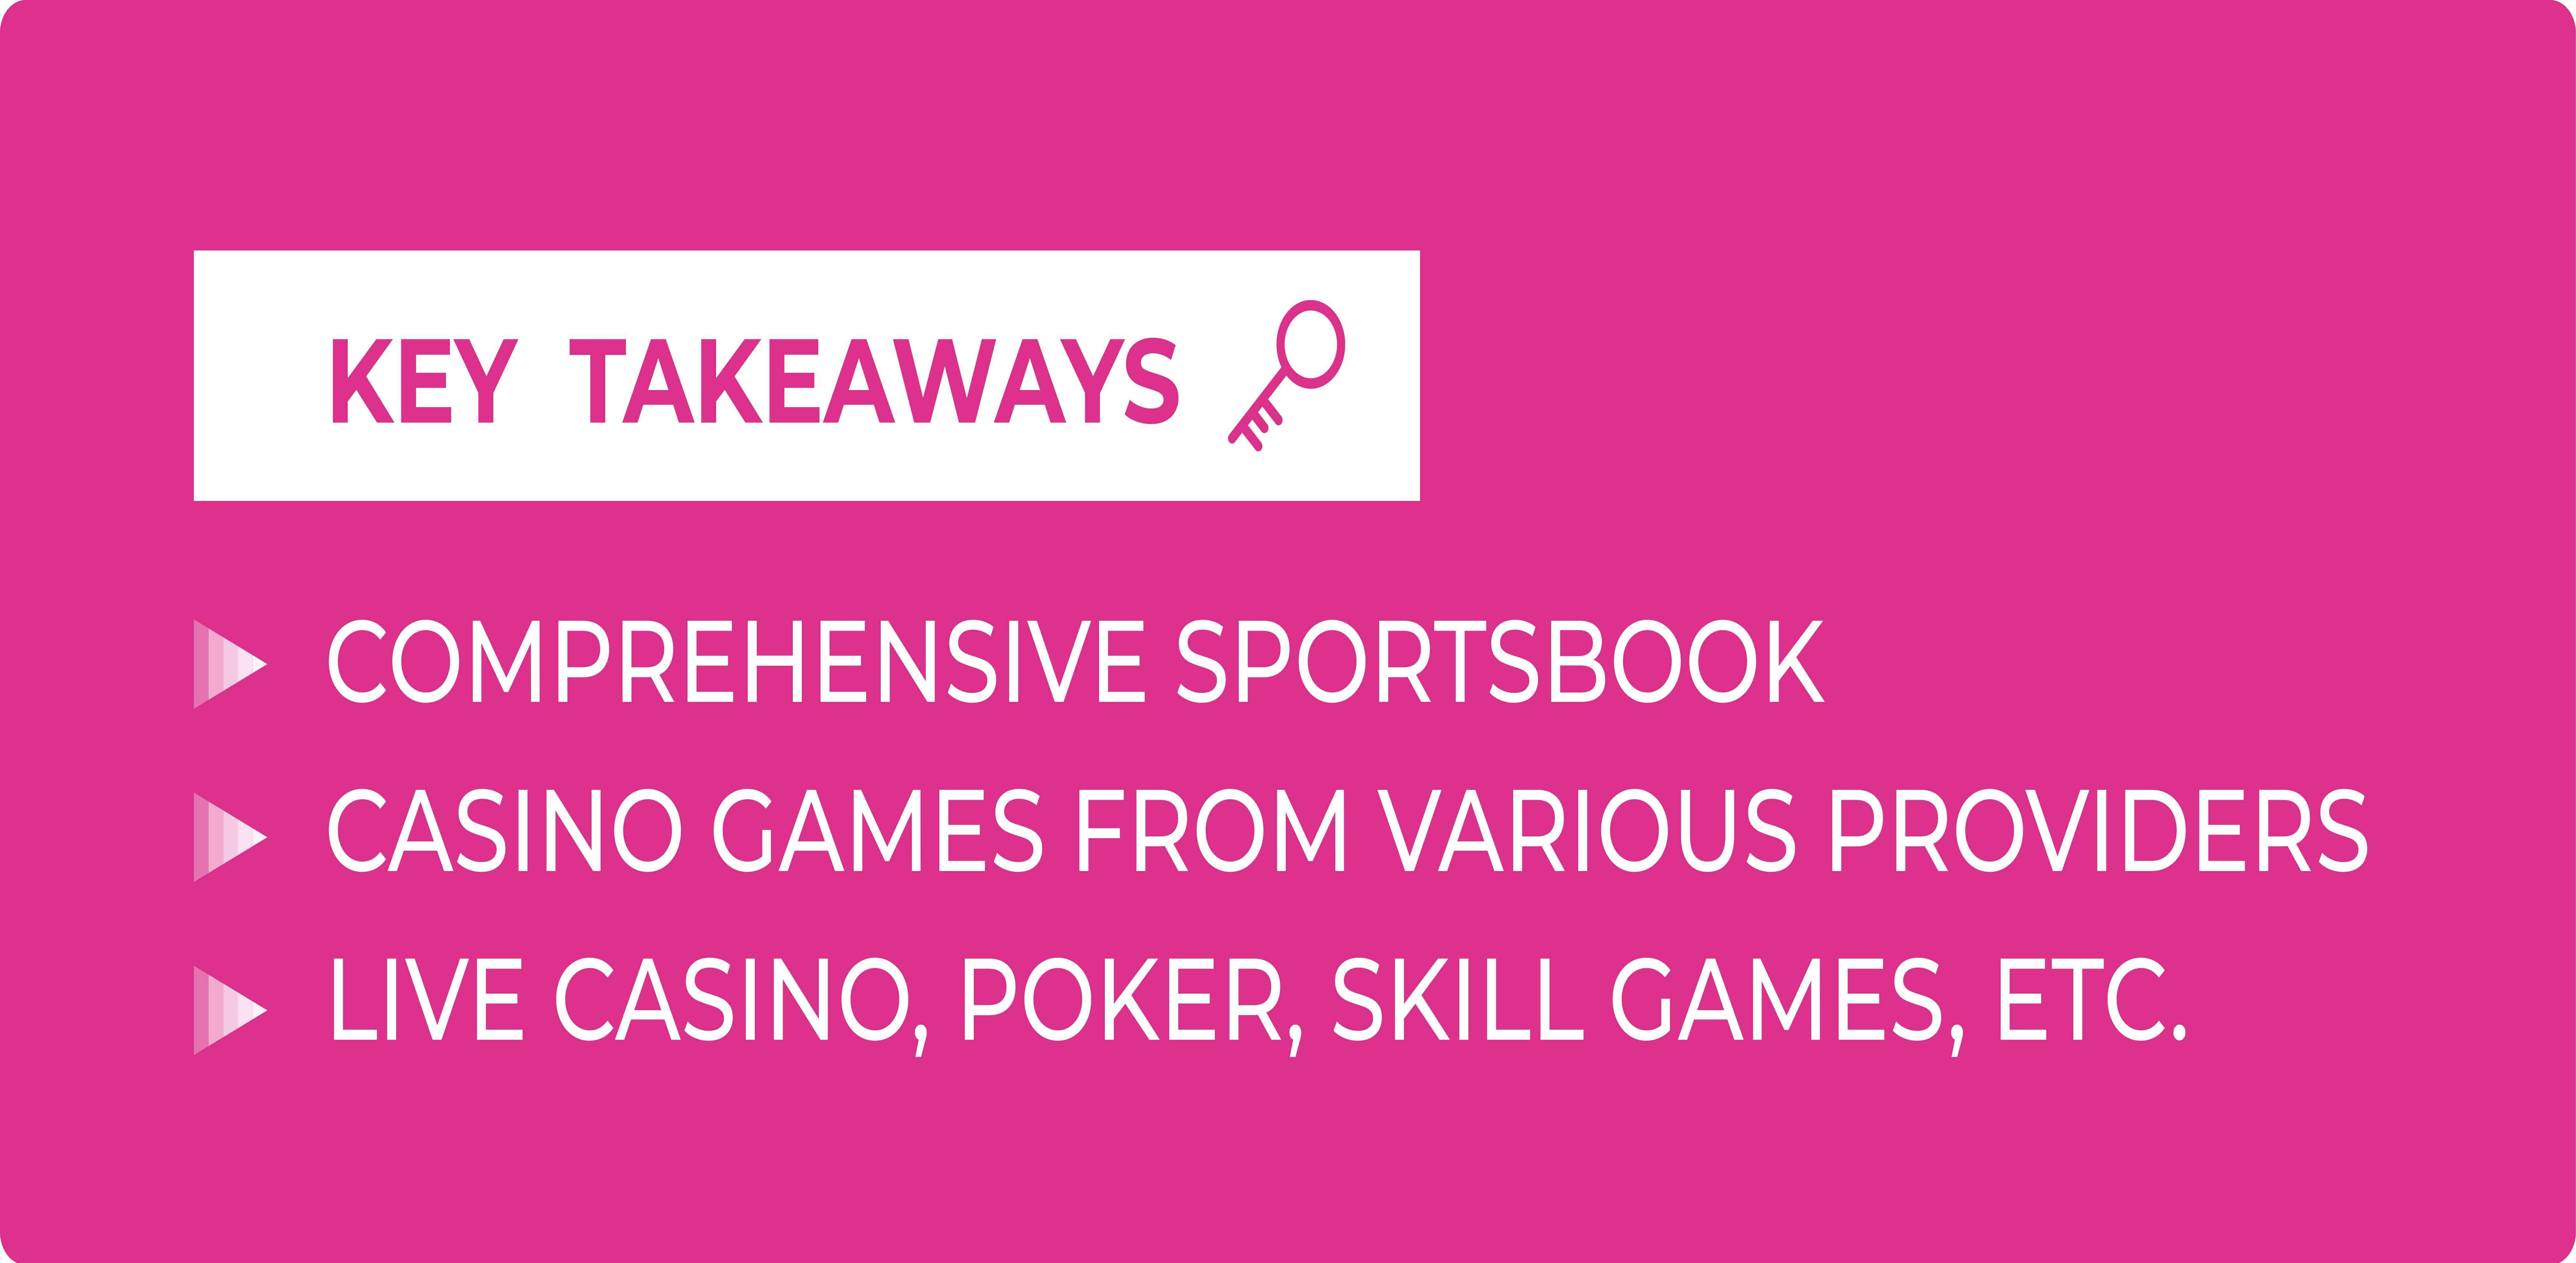 BetConstruct sportsbook, casino, live casino